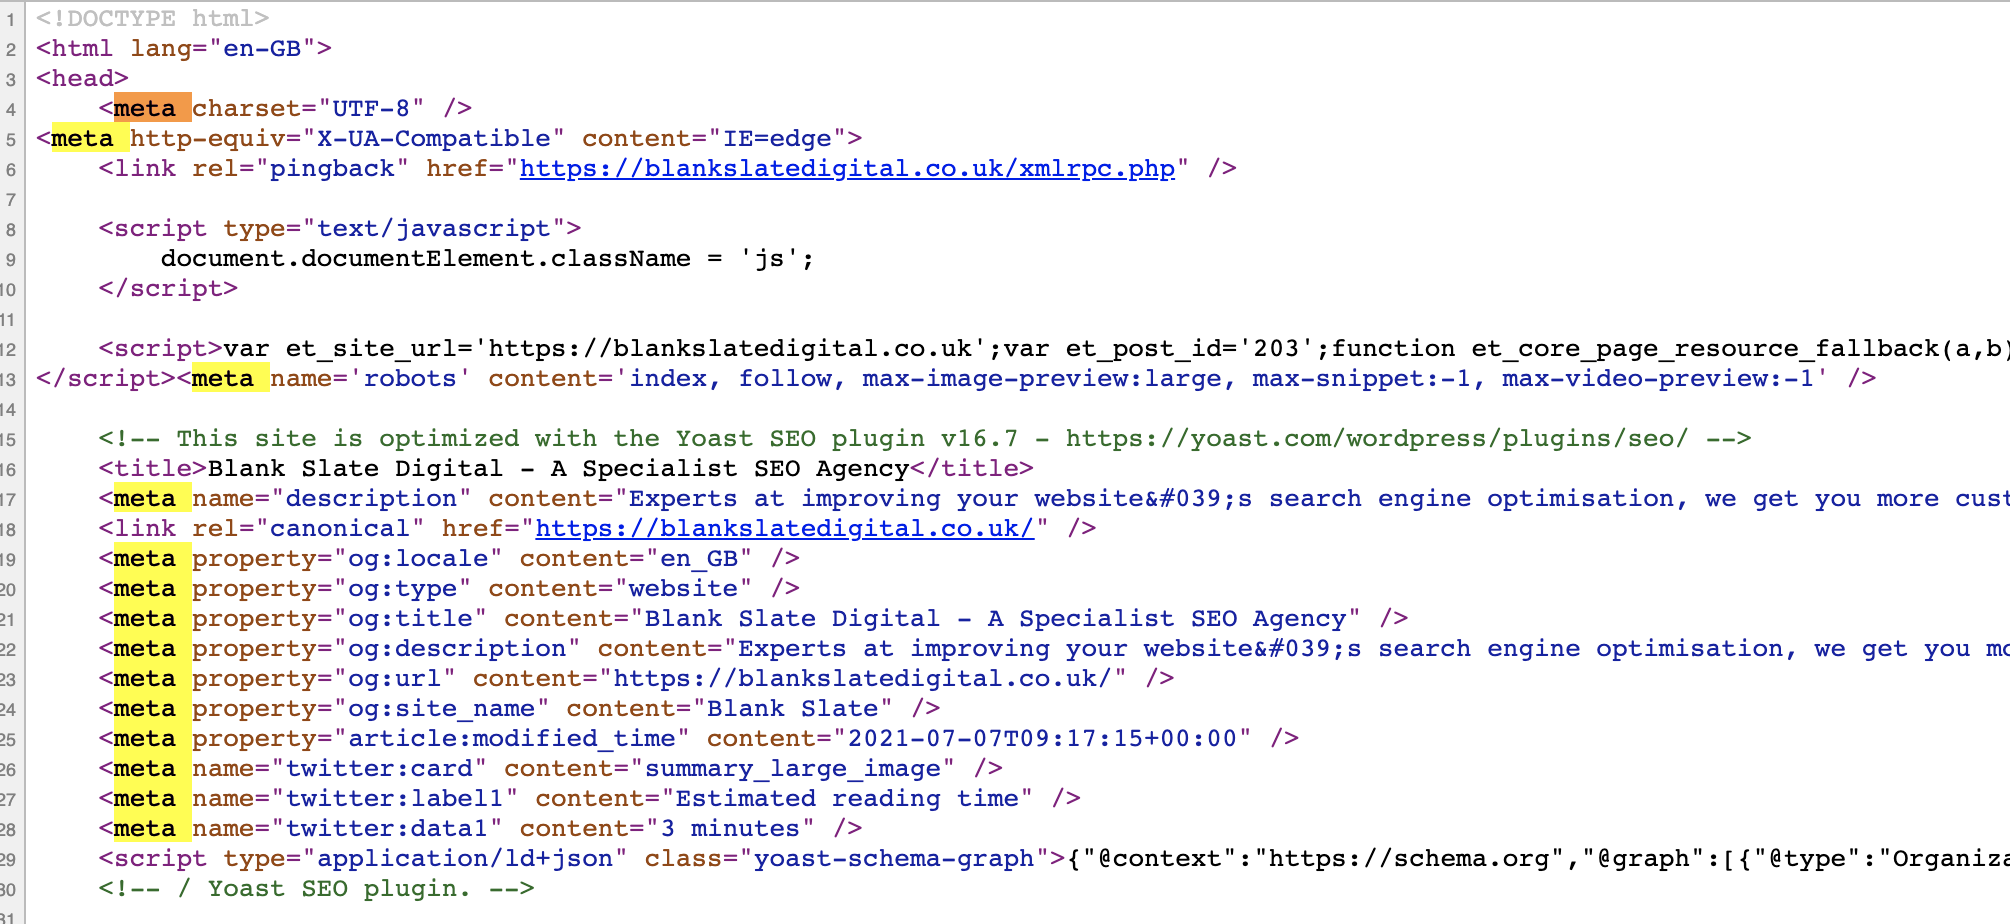 screenshot of meta tags in html